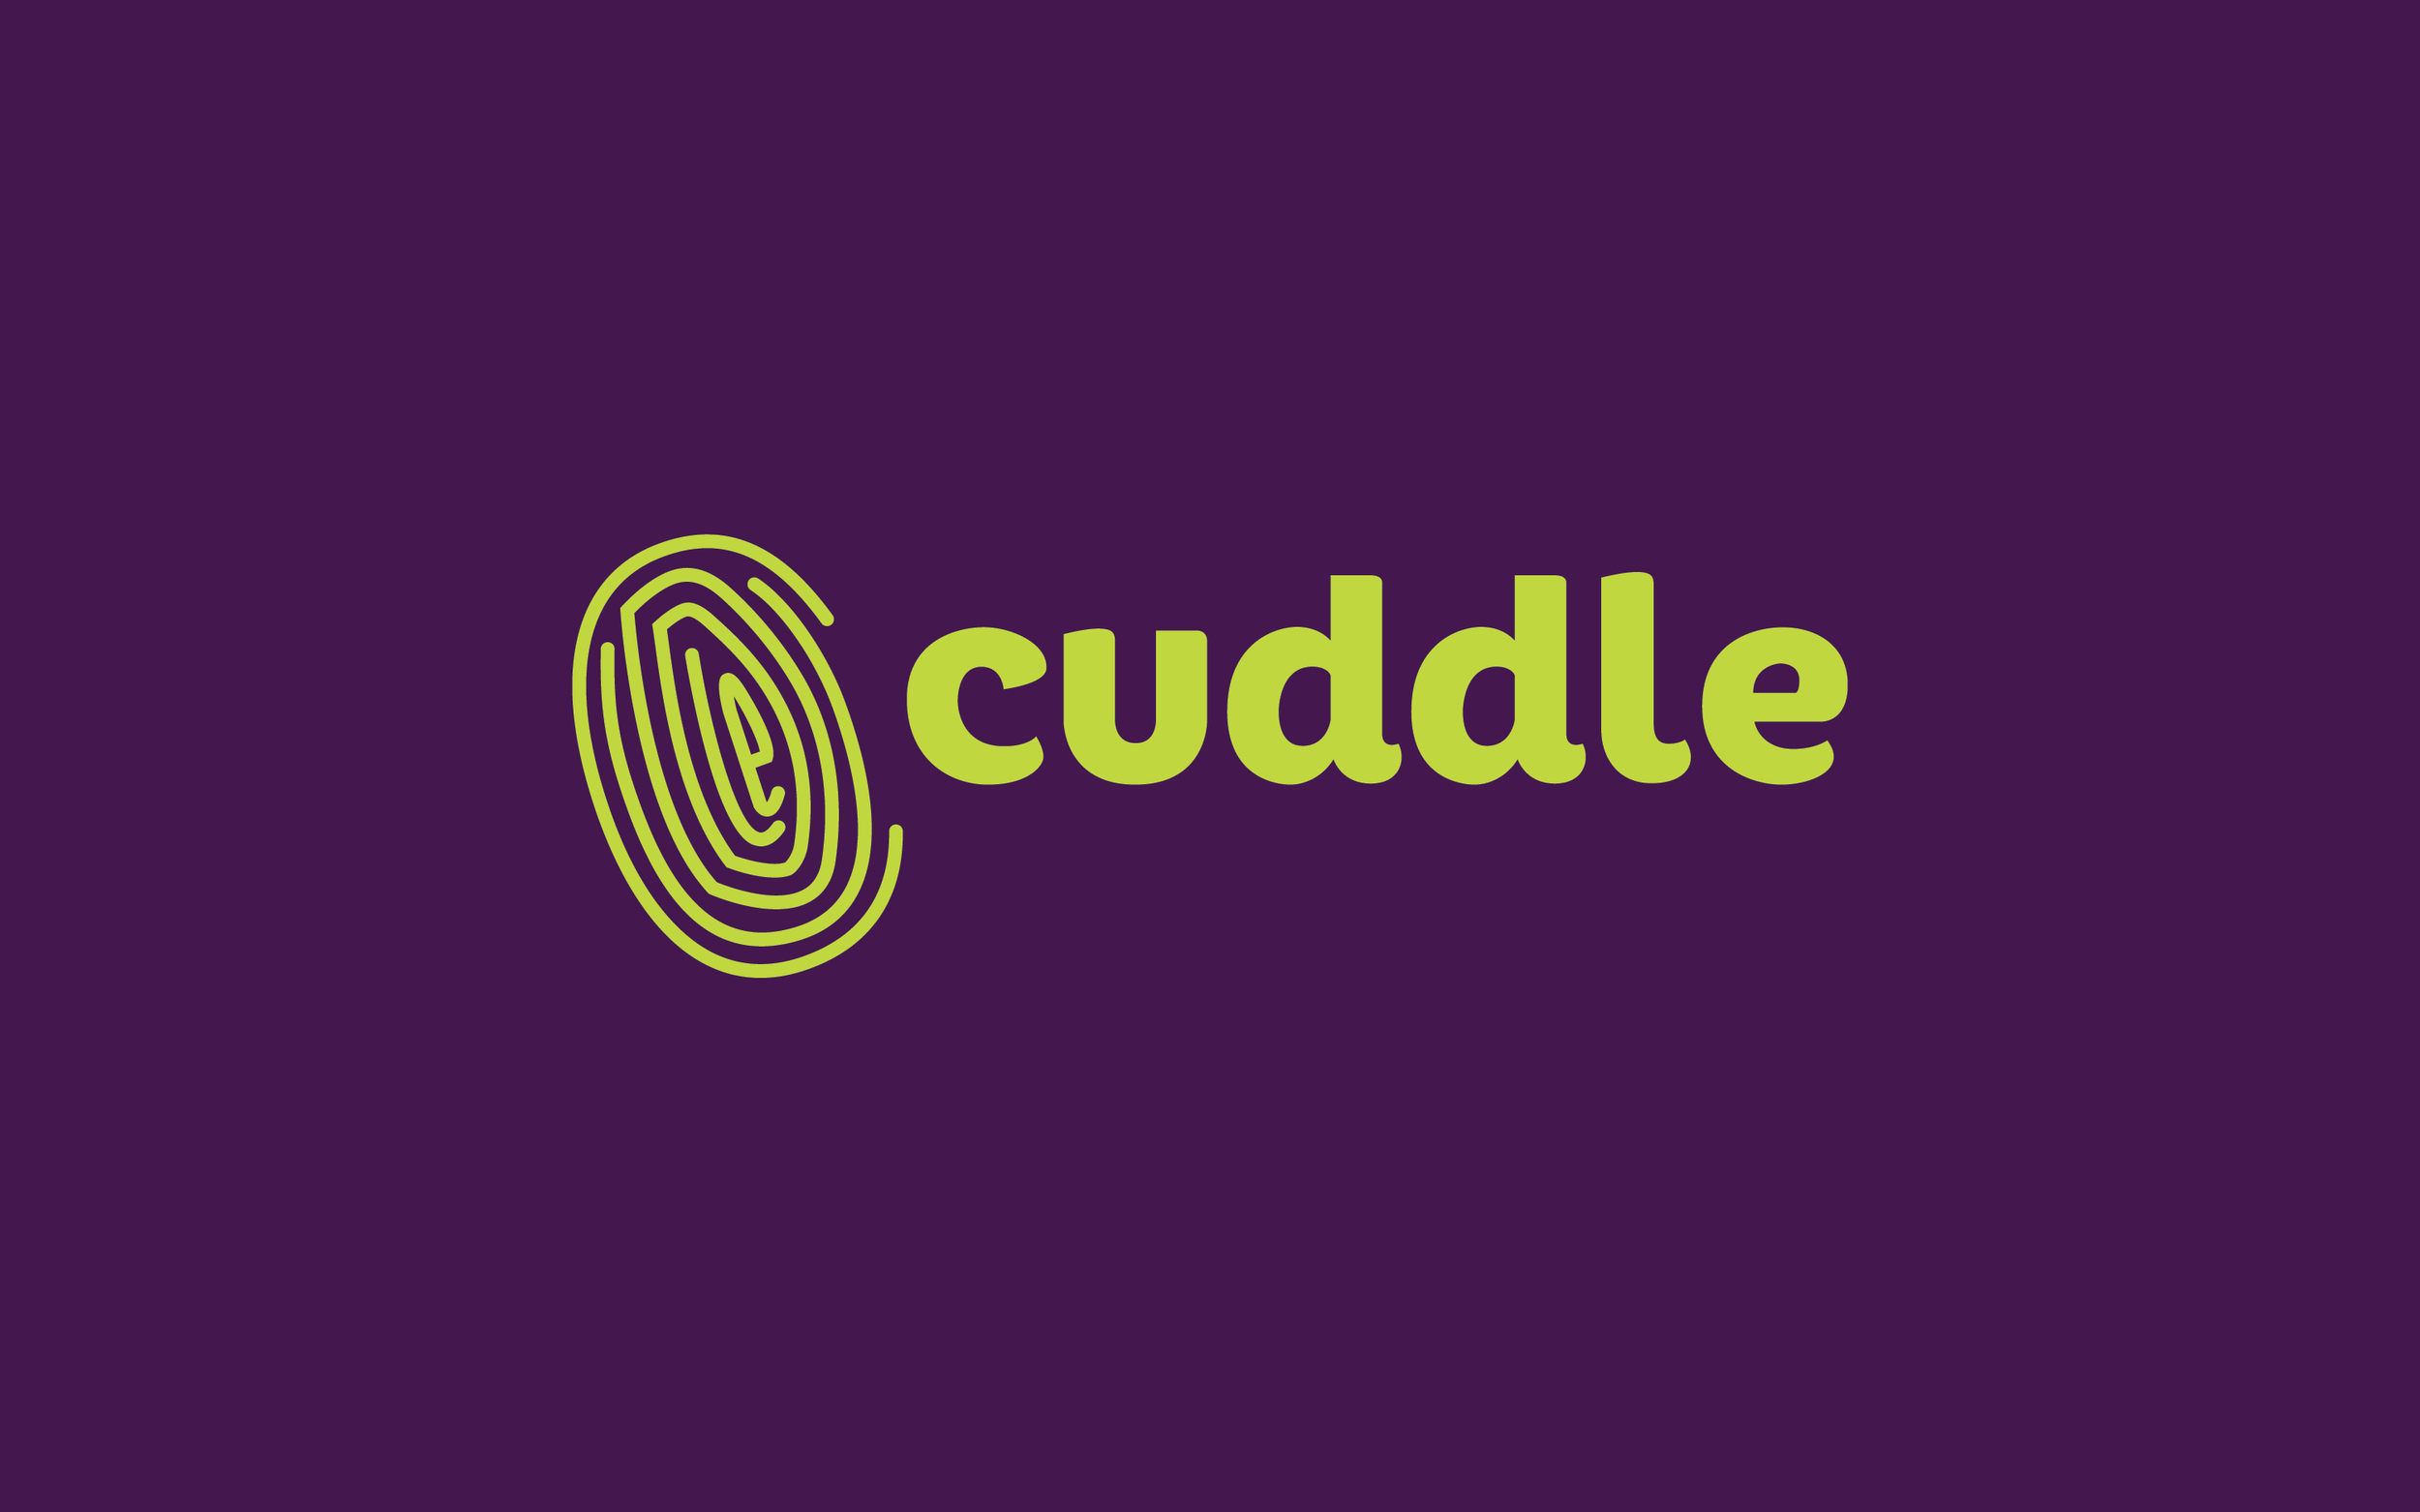 Hiren_Cuddle-01a.png